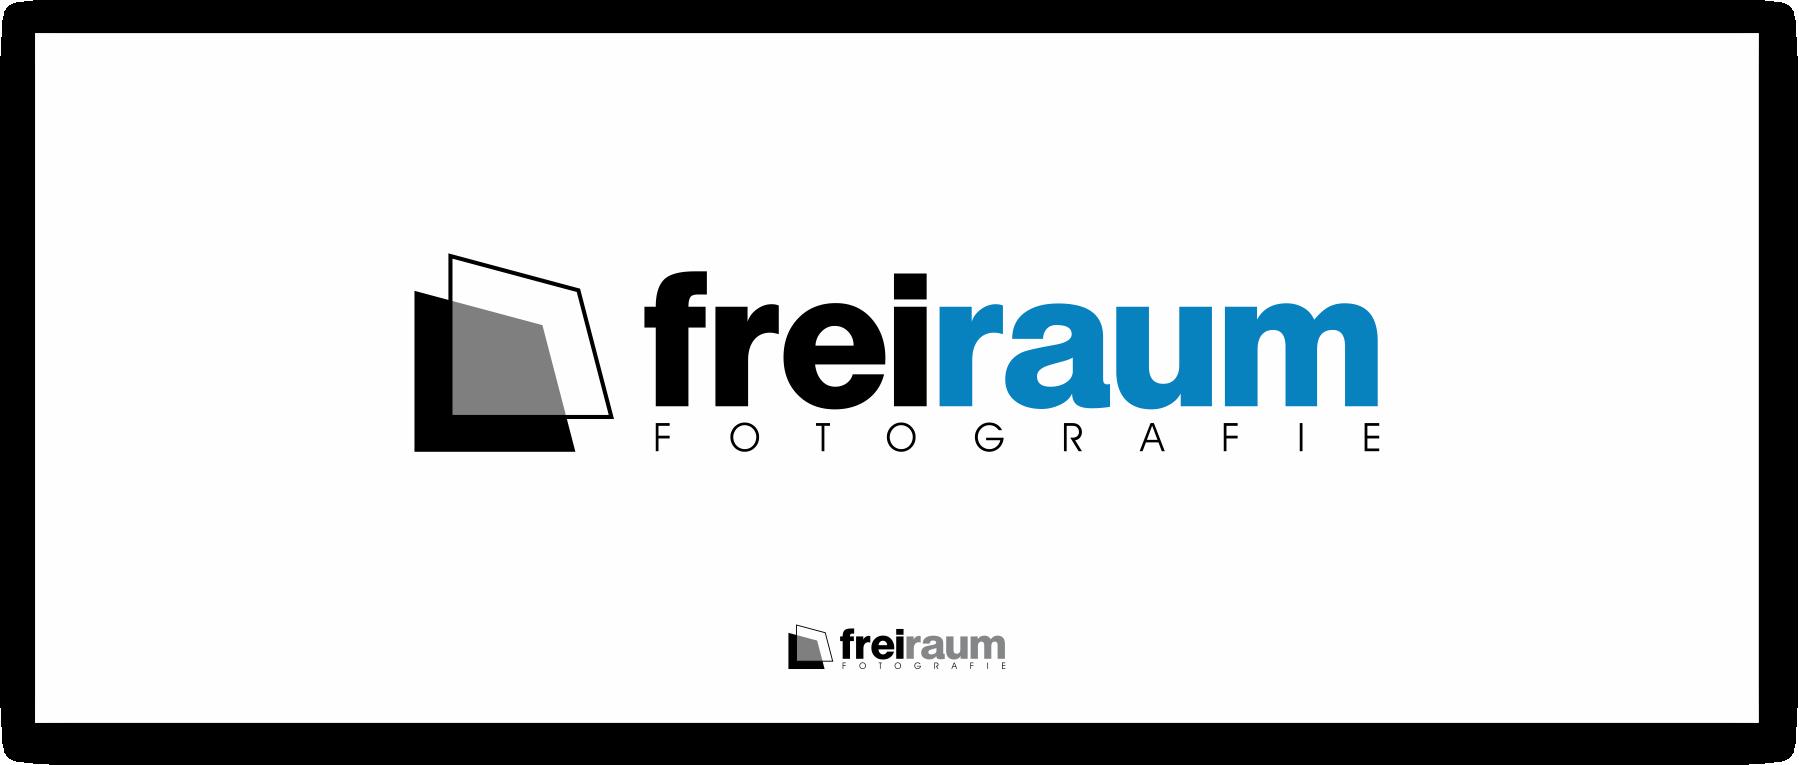 Create the next logo for Freiraum Fotografie GmbH & Co KG